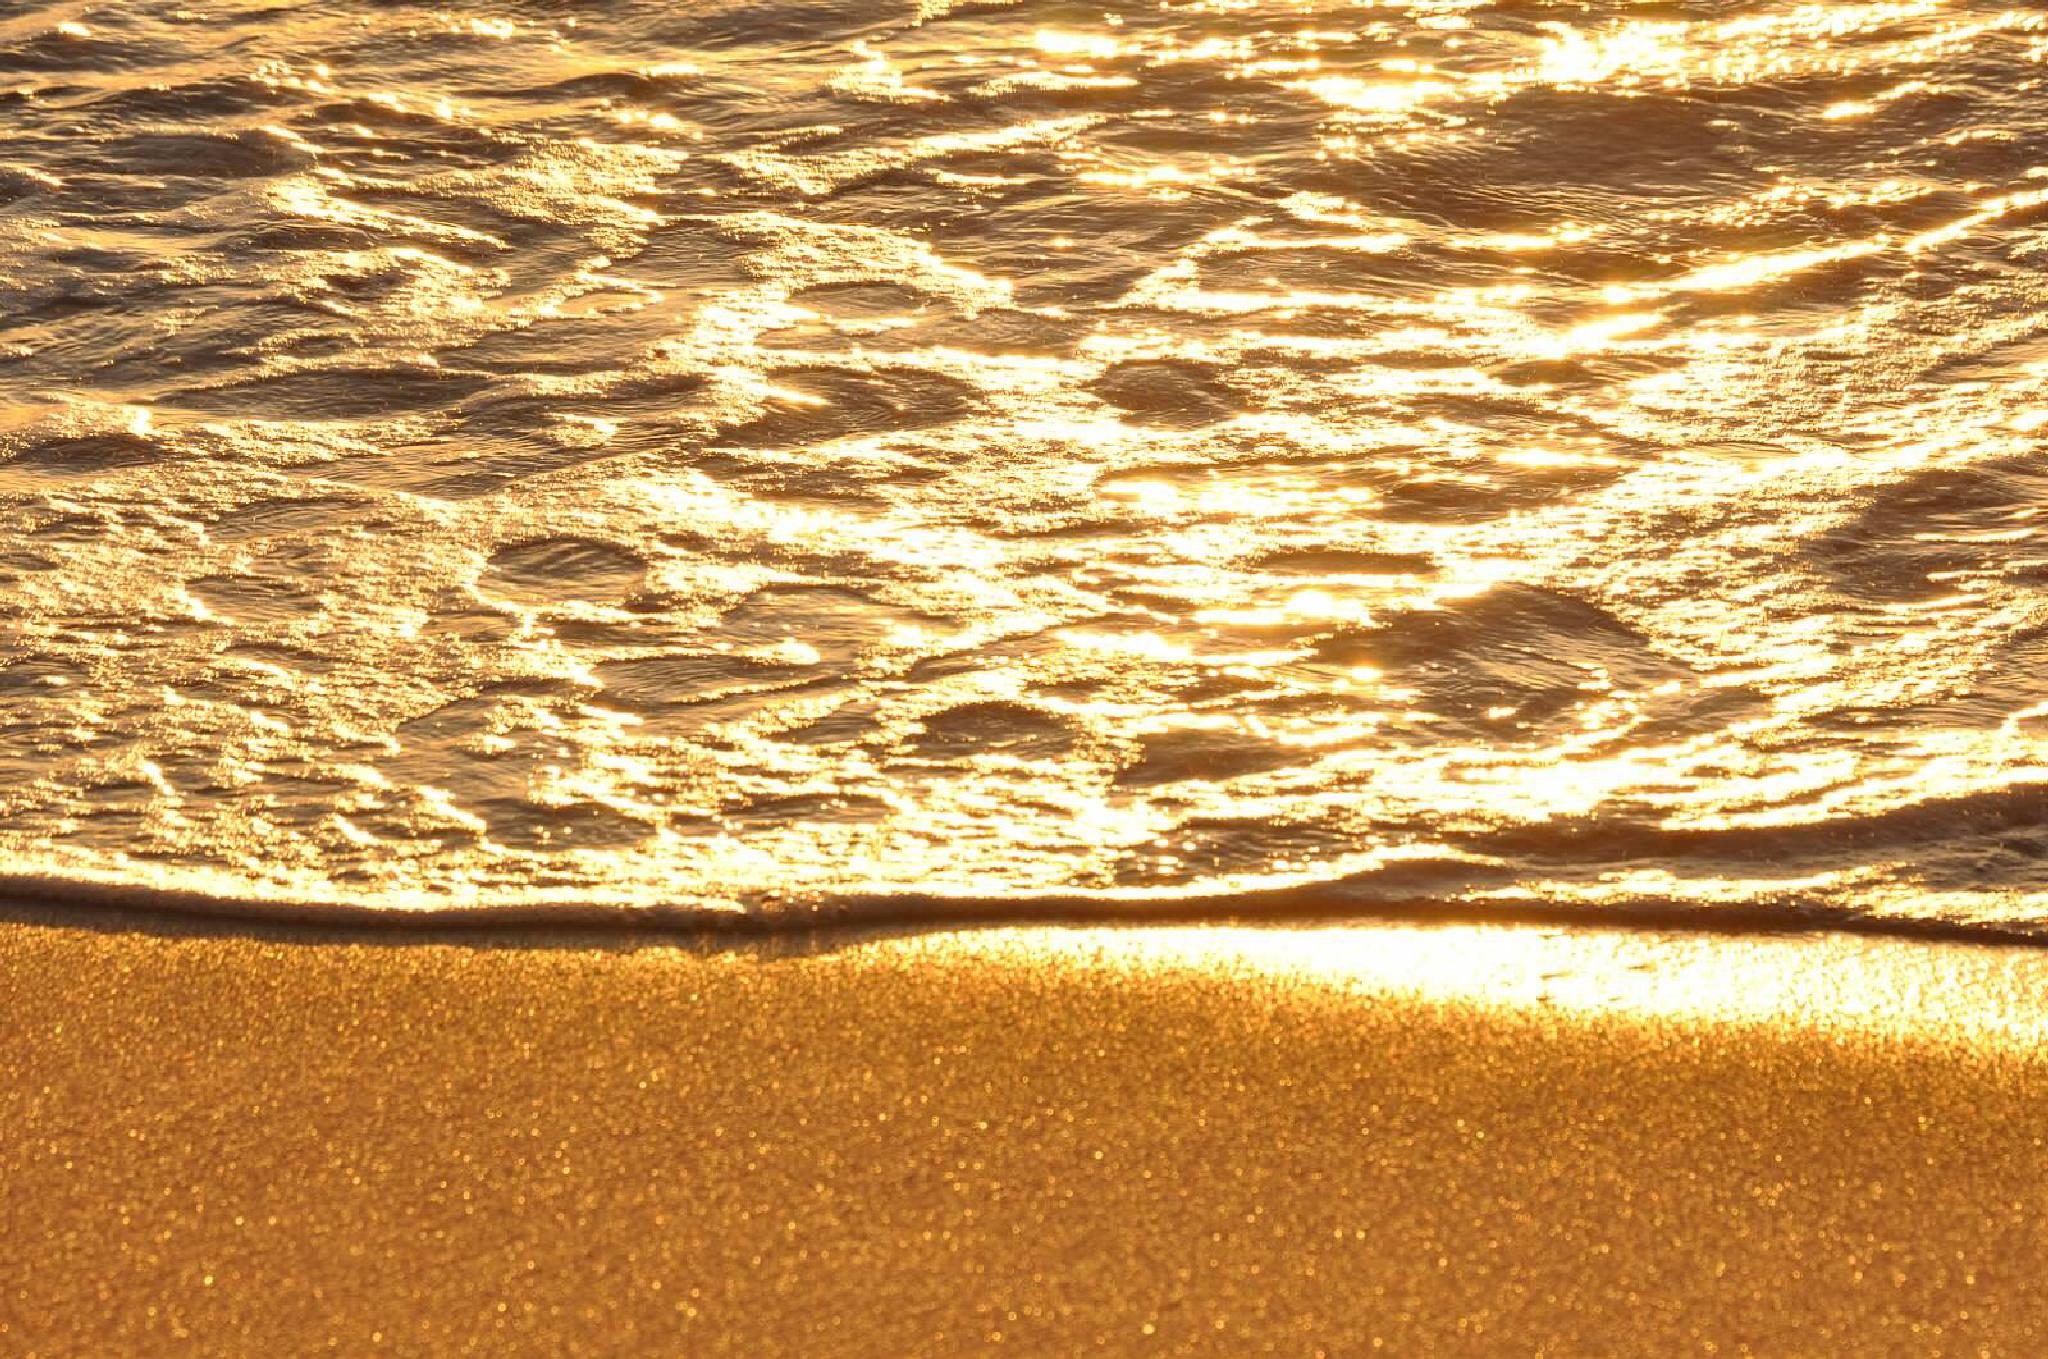 Golden Sands by Joy W. Goldman